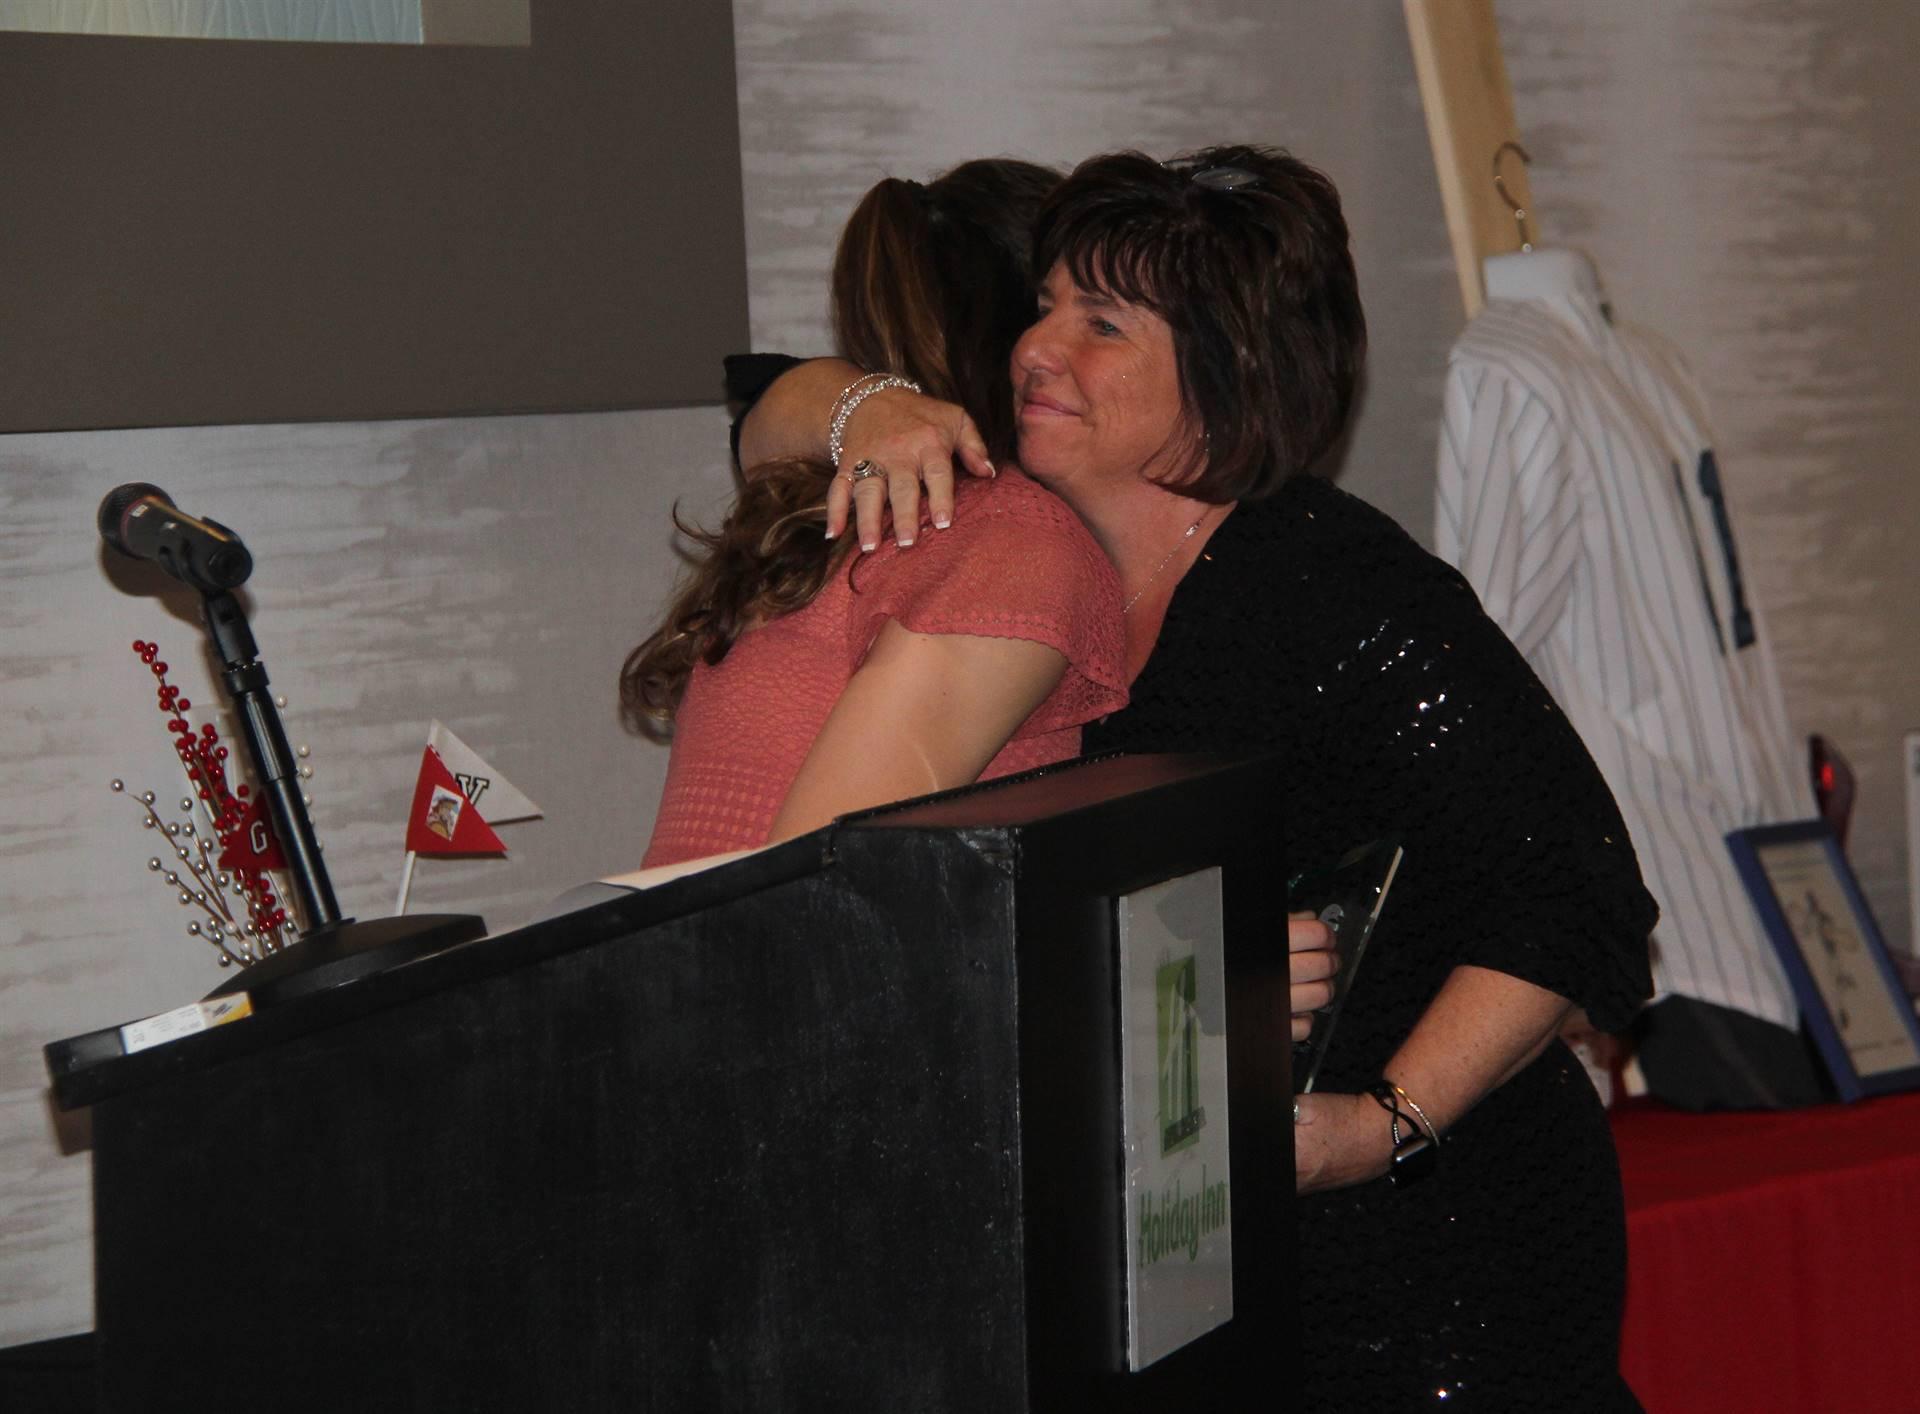 honoree hugging student